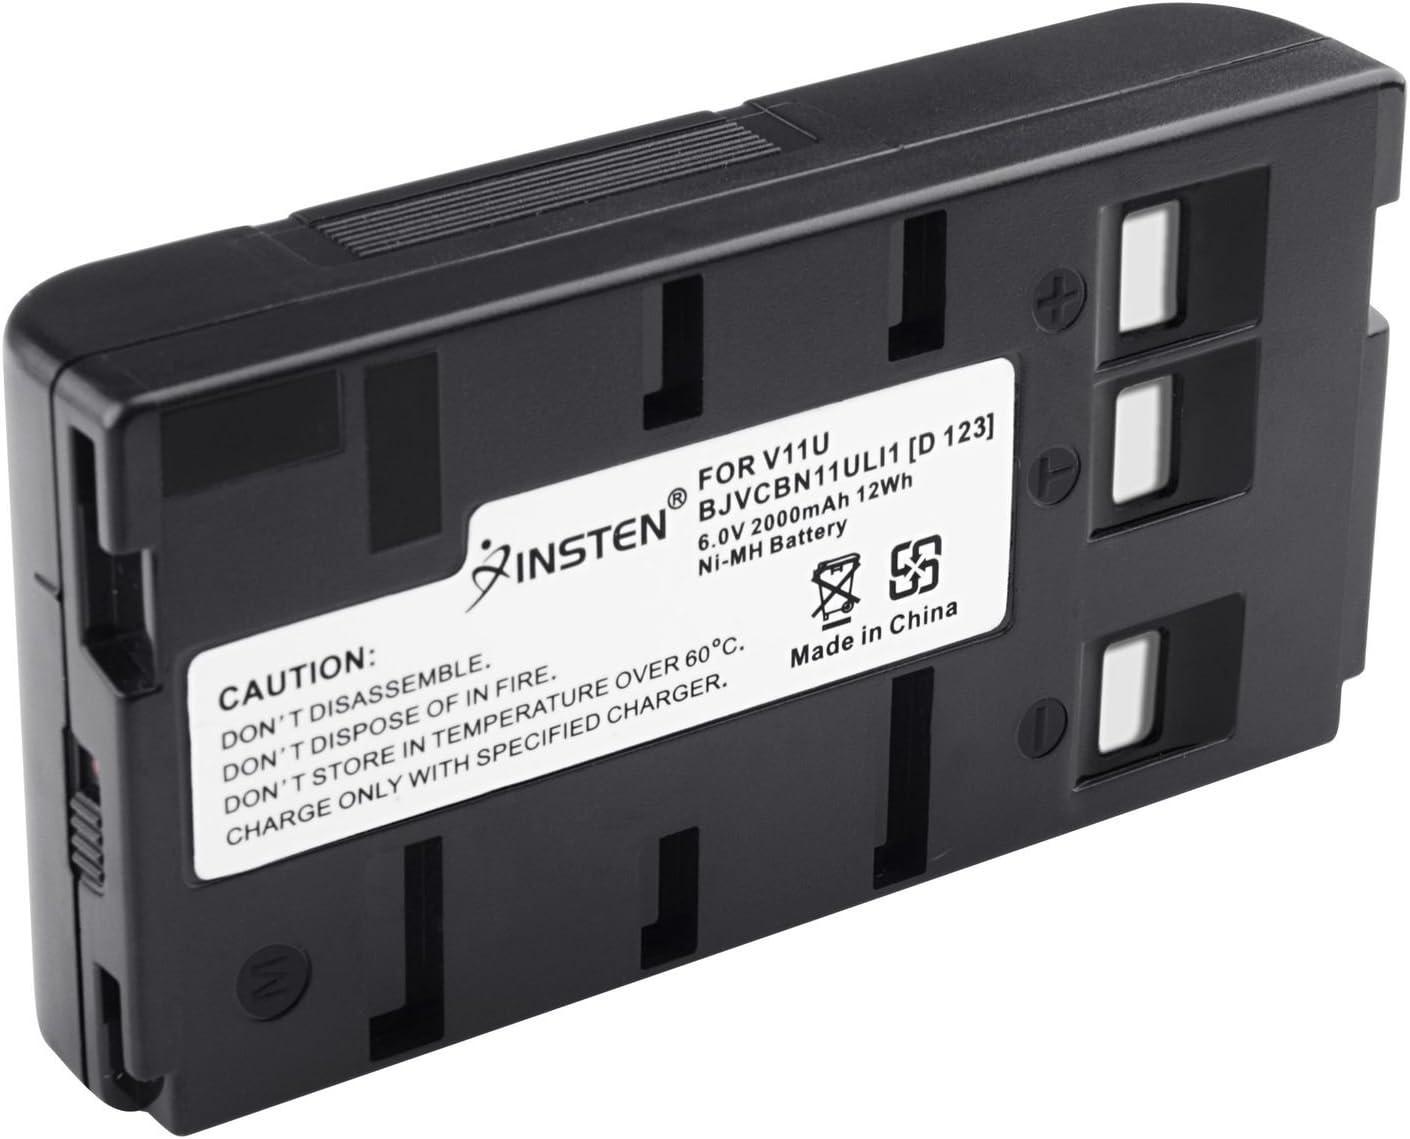 BN-V11U Insten Rechargeable Camcorder Battery High Capacity for JVC BN-V10U, BN-V11U, BN-V12U, BN-V14U, BN-V15, BN-V18U, BN-V22U, BN-V24U, BN-V25U PANASONIC PV-BP15 PV-BP17 Digital Camera : Camcorder Batteries : Camera & Photo